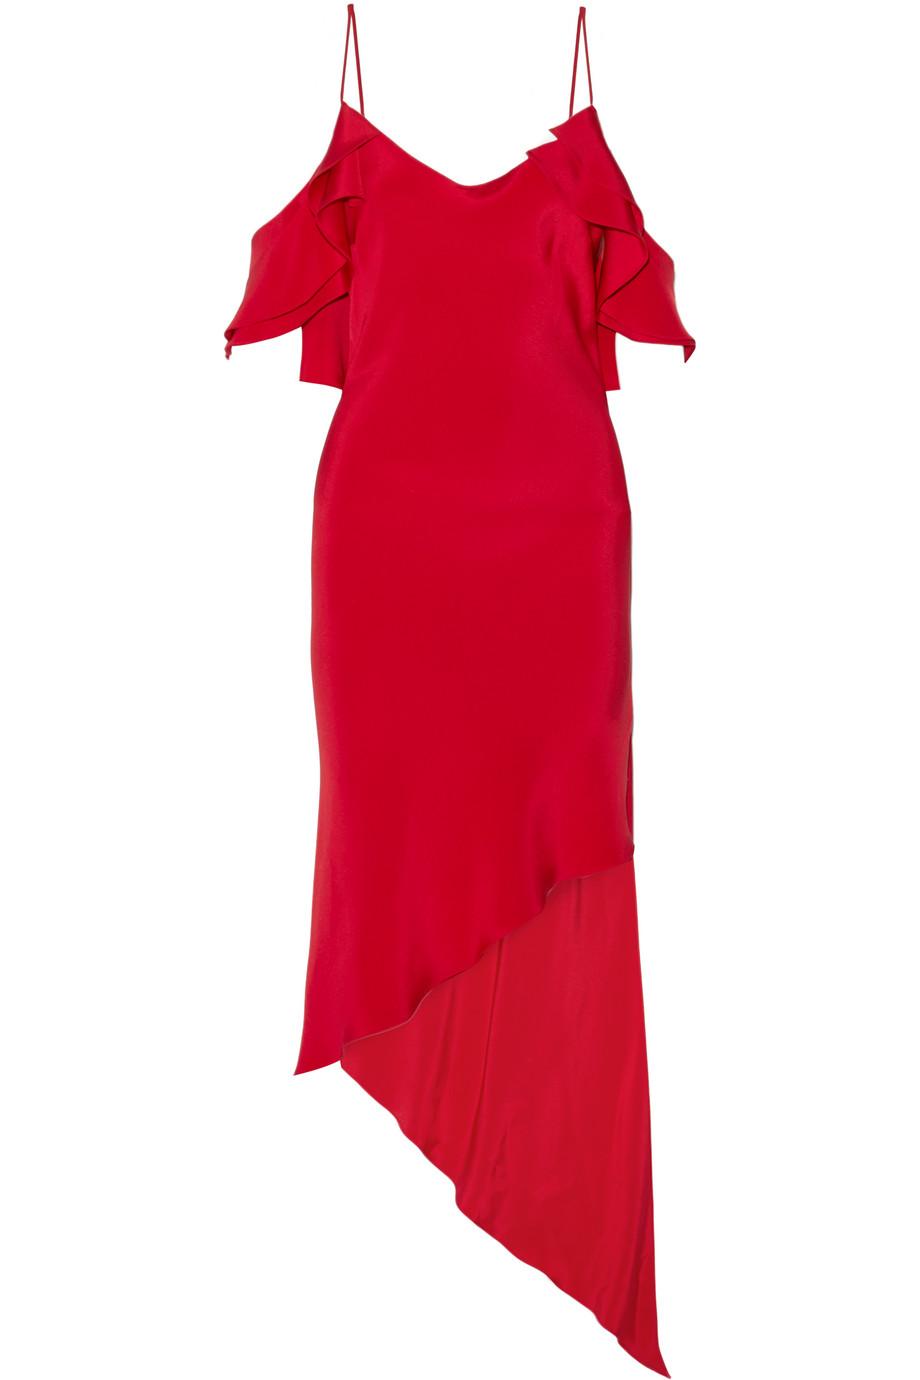 Spiral Ruffled Asymmetric Silk-Satin Dress, Red, Women's, Size: 10